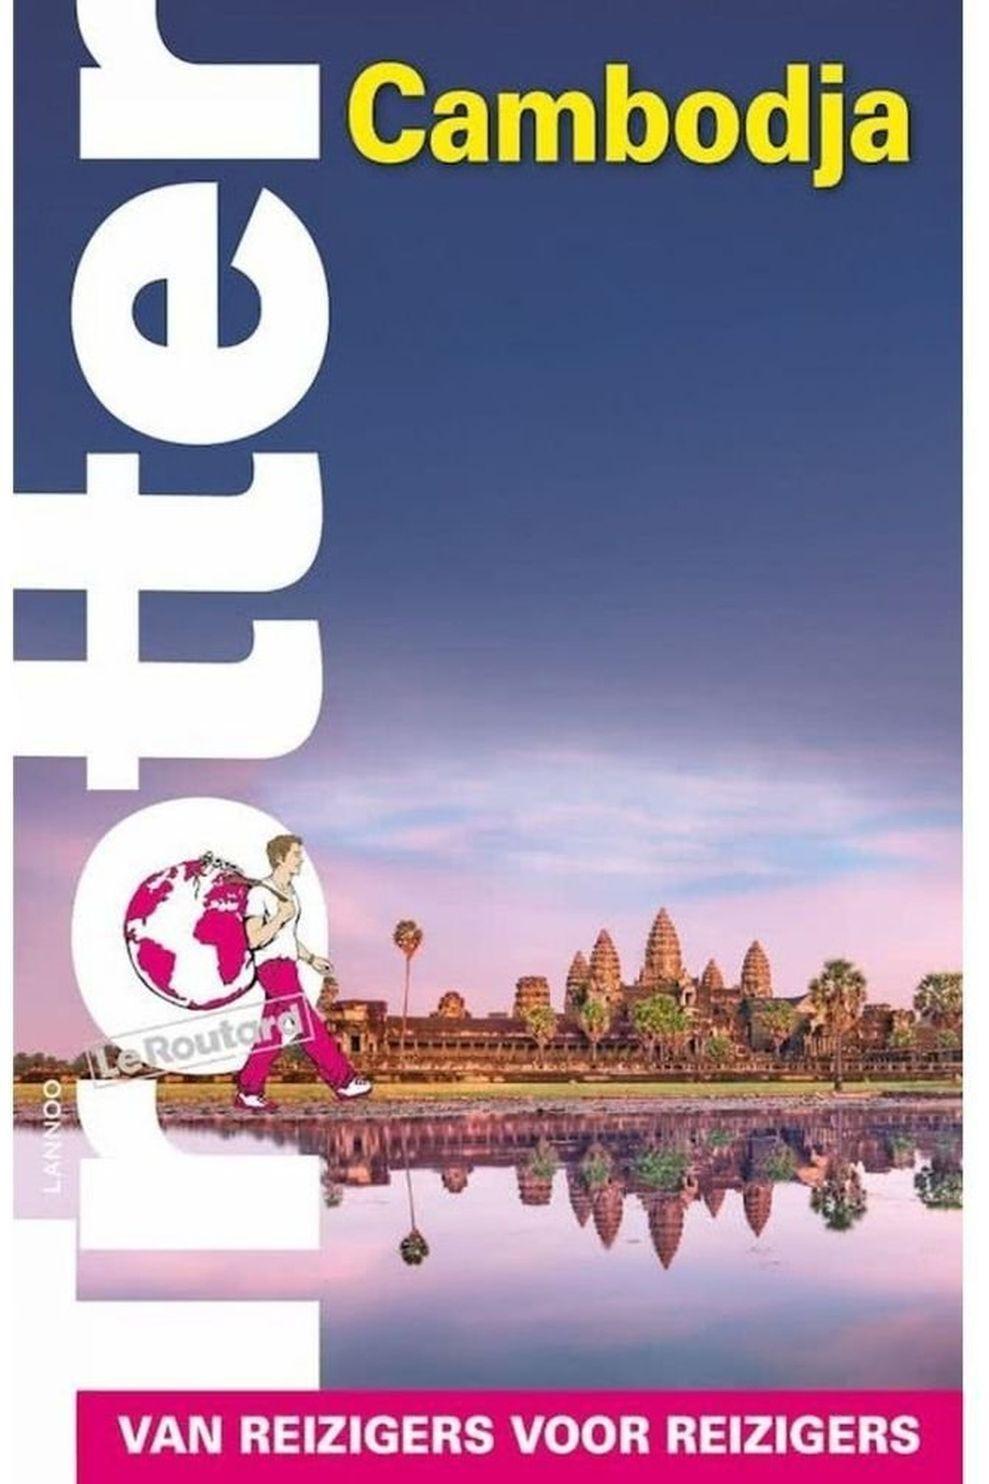 Trotter Cambodja Trotter - 2017